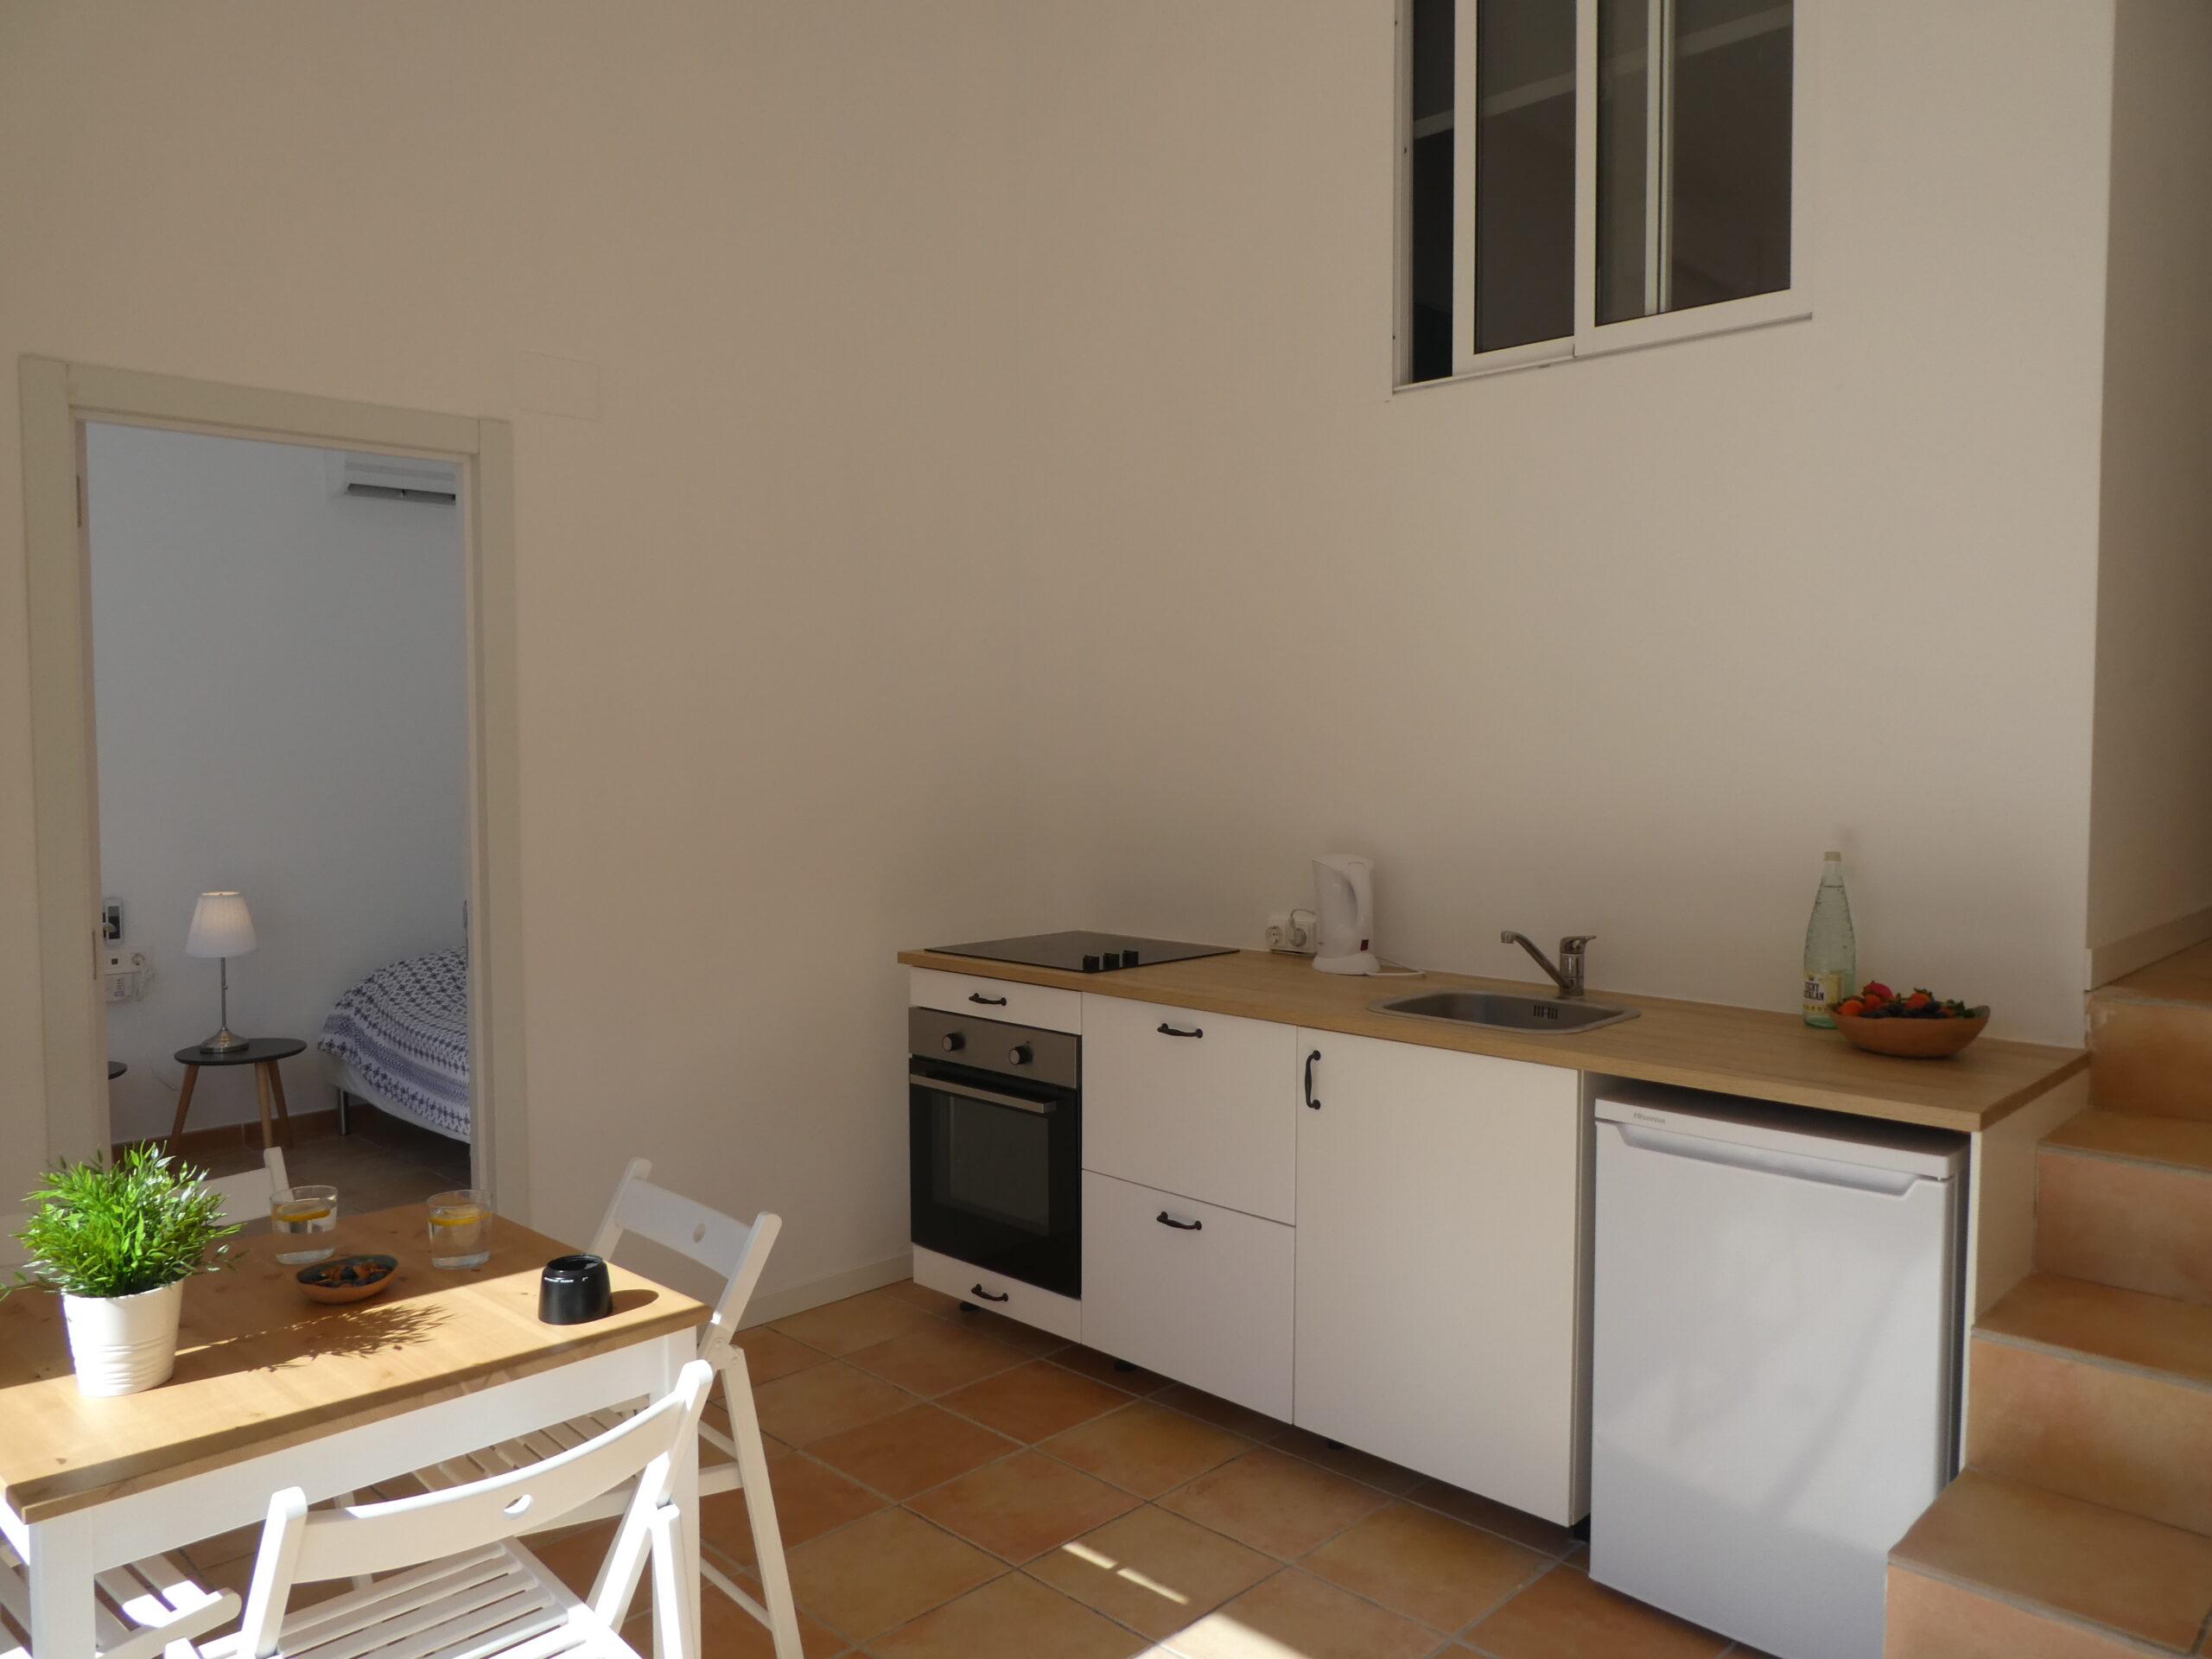 Apartment3_kitchen